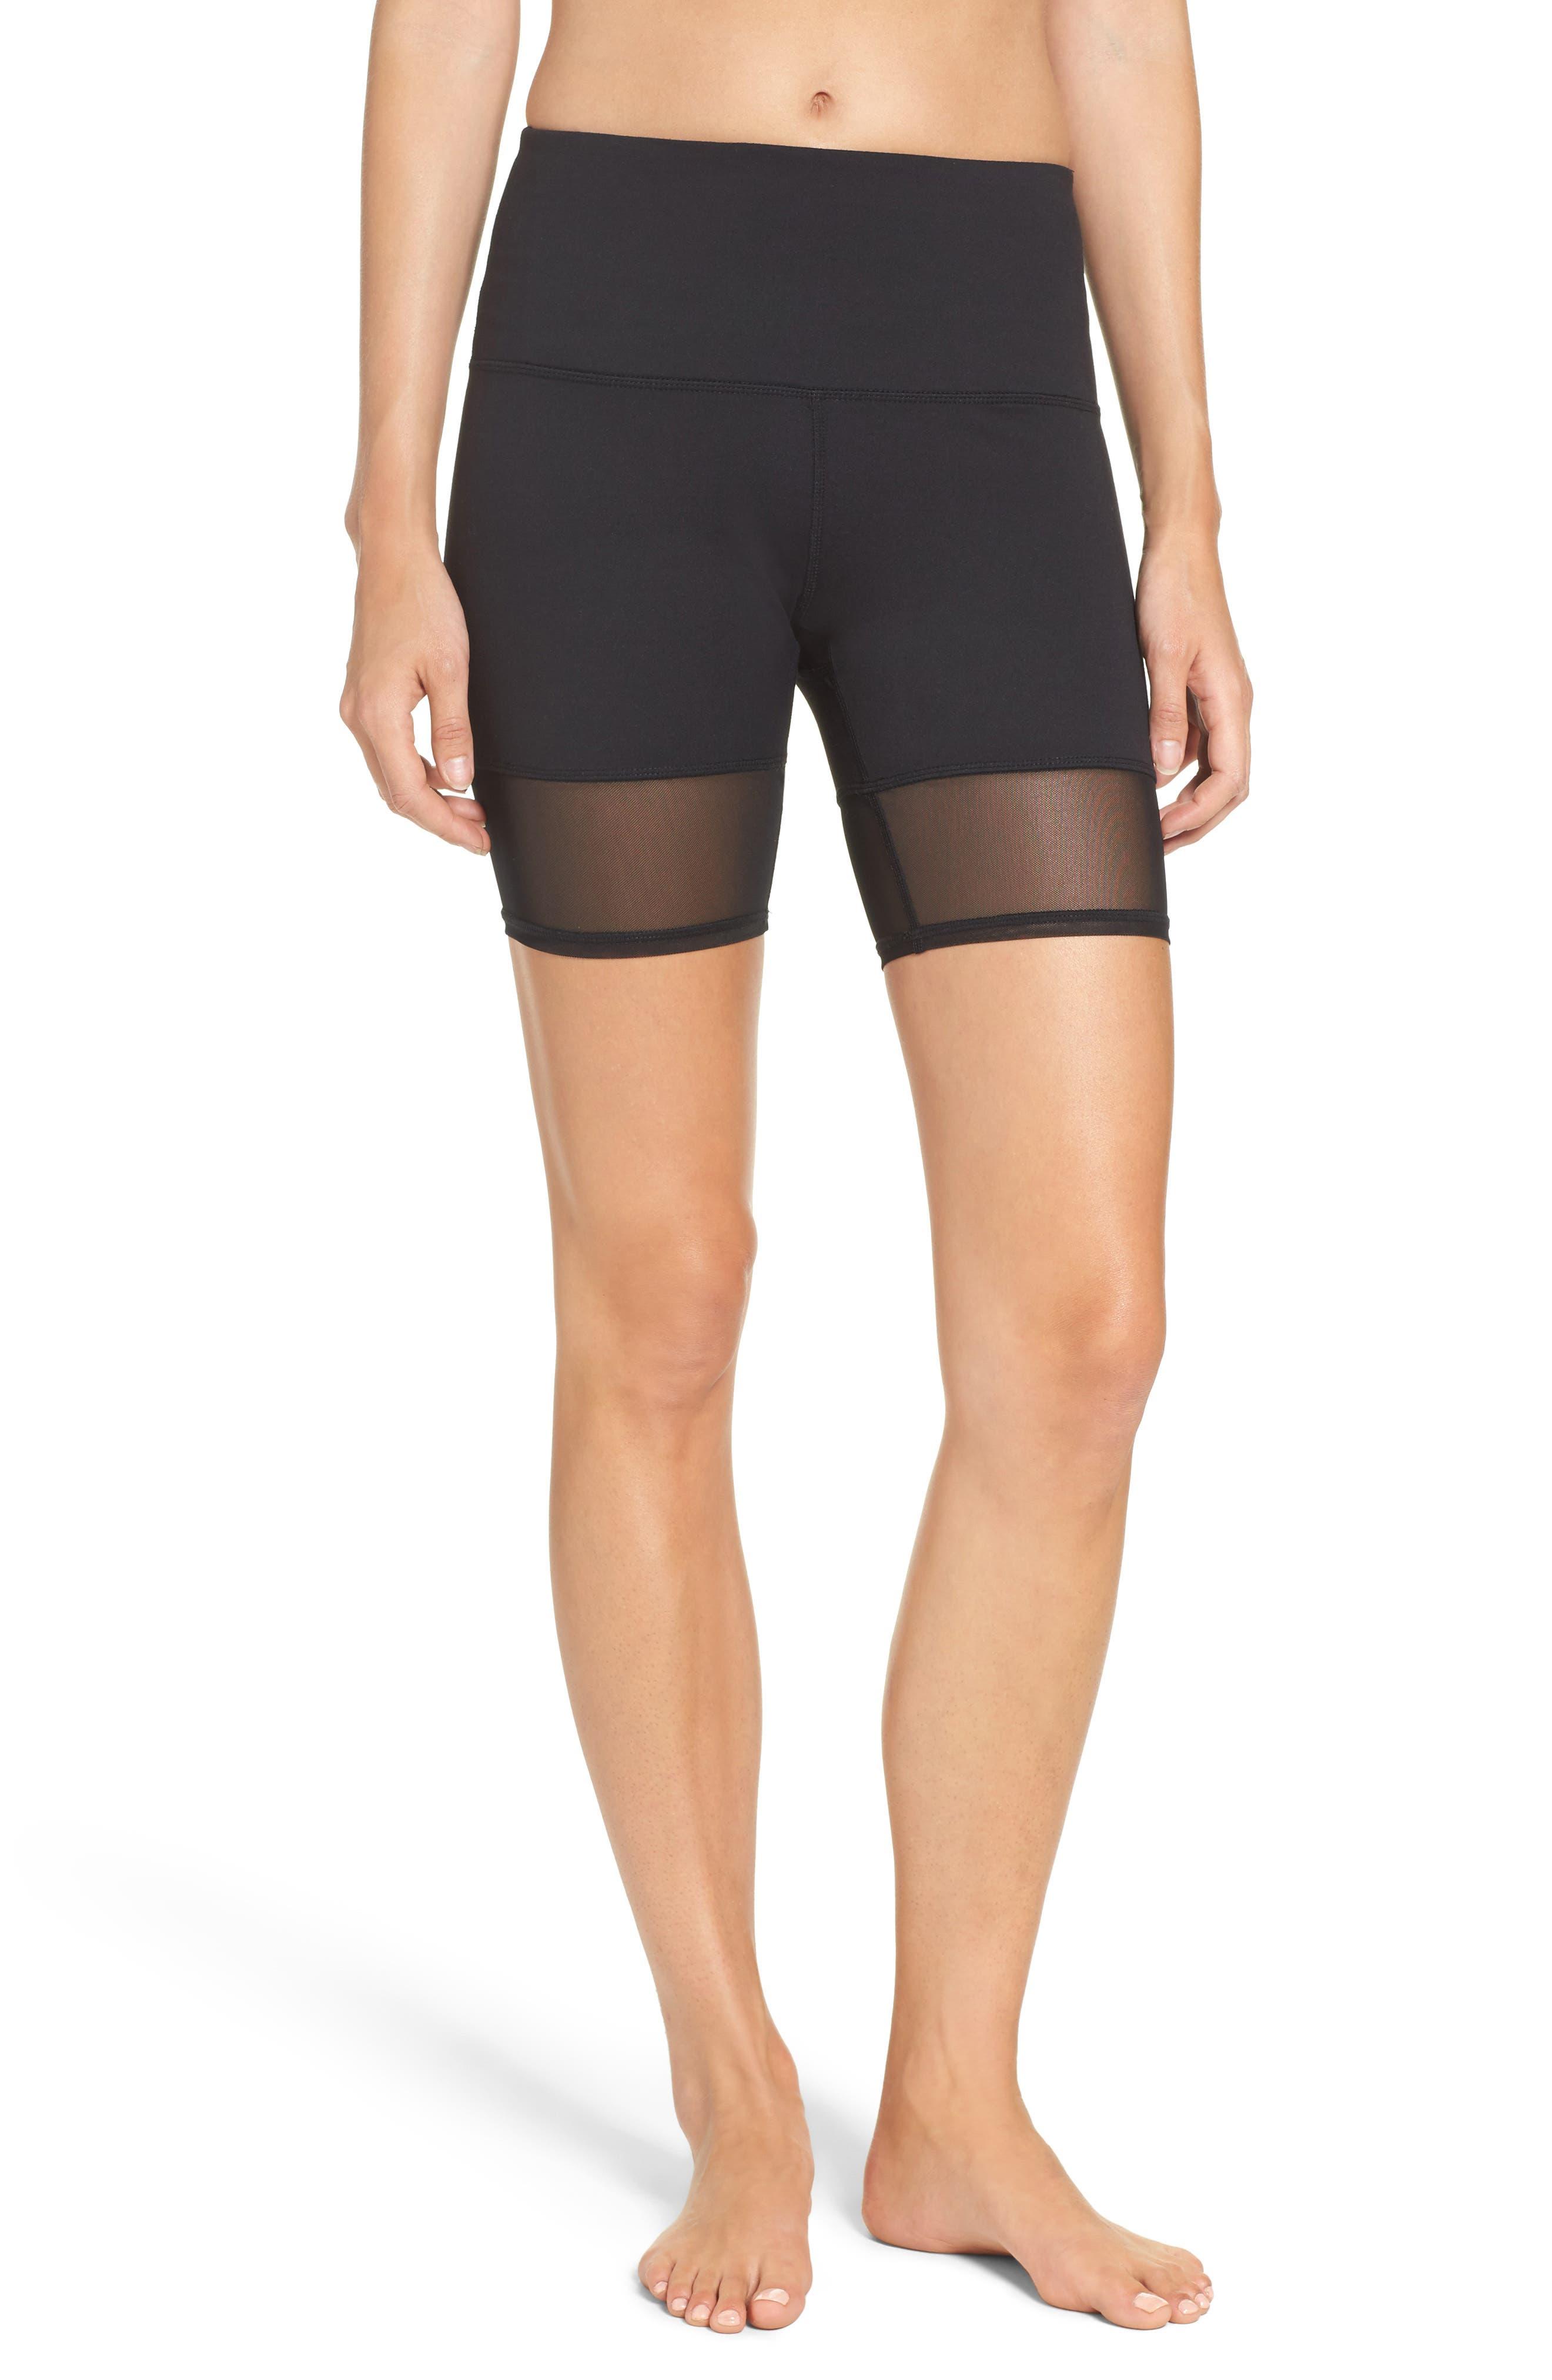 Main Image - Zella Mia High Waist Mesh Bike Shorts